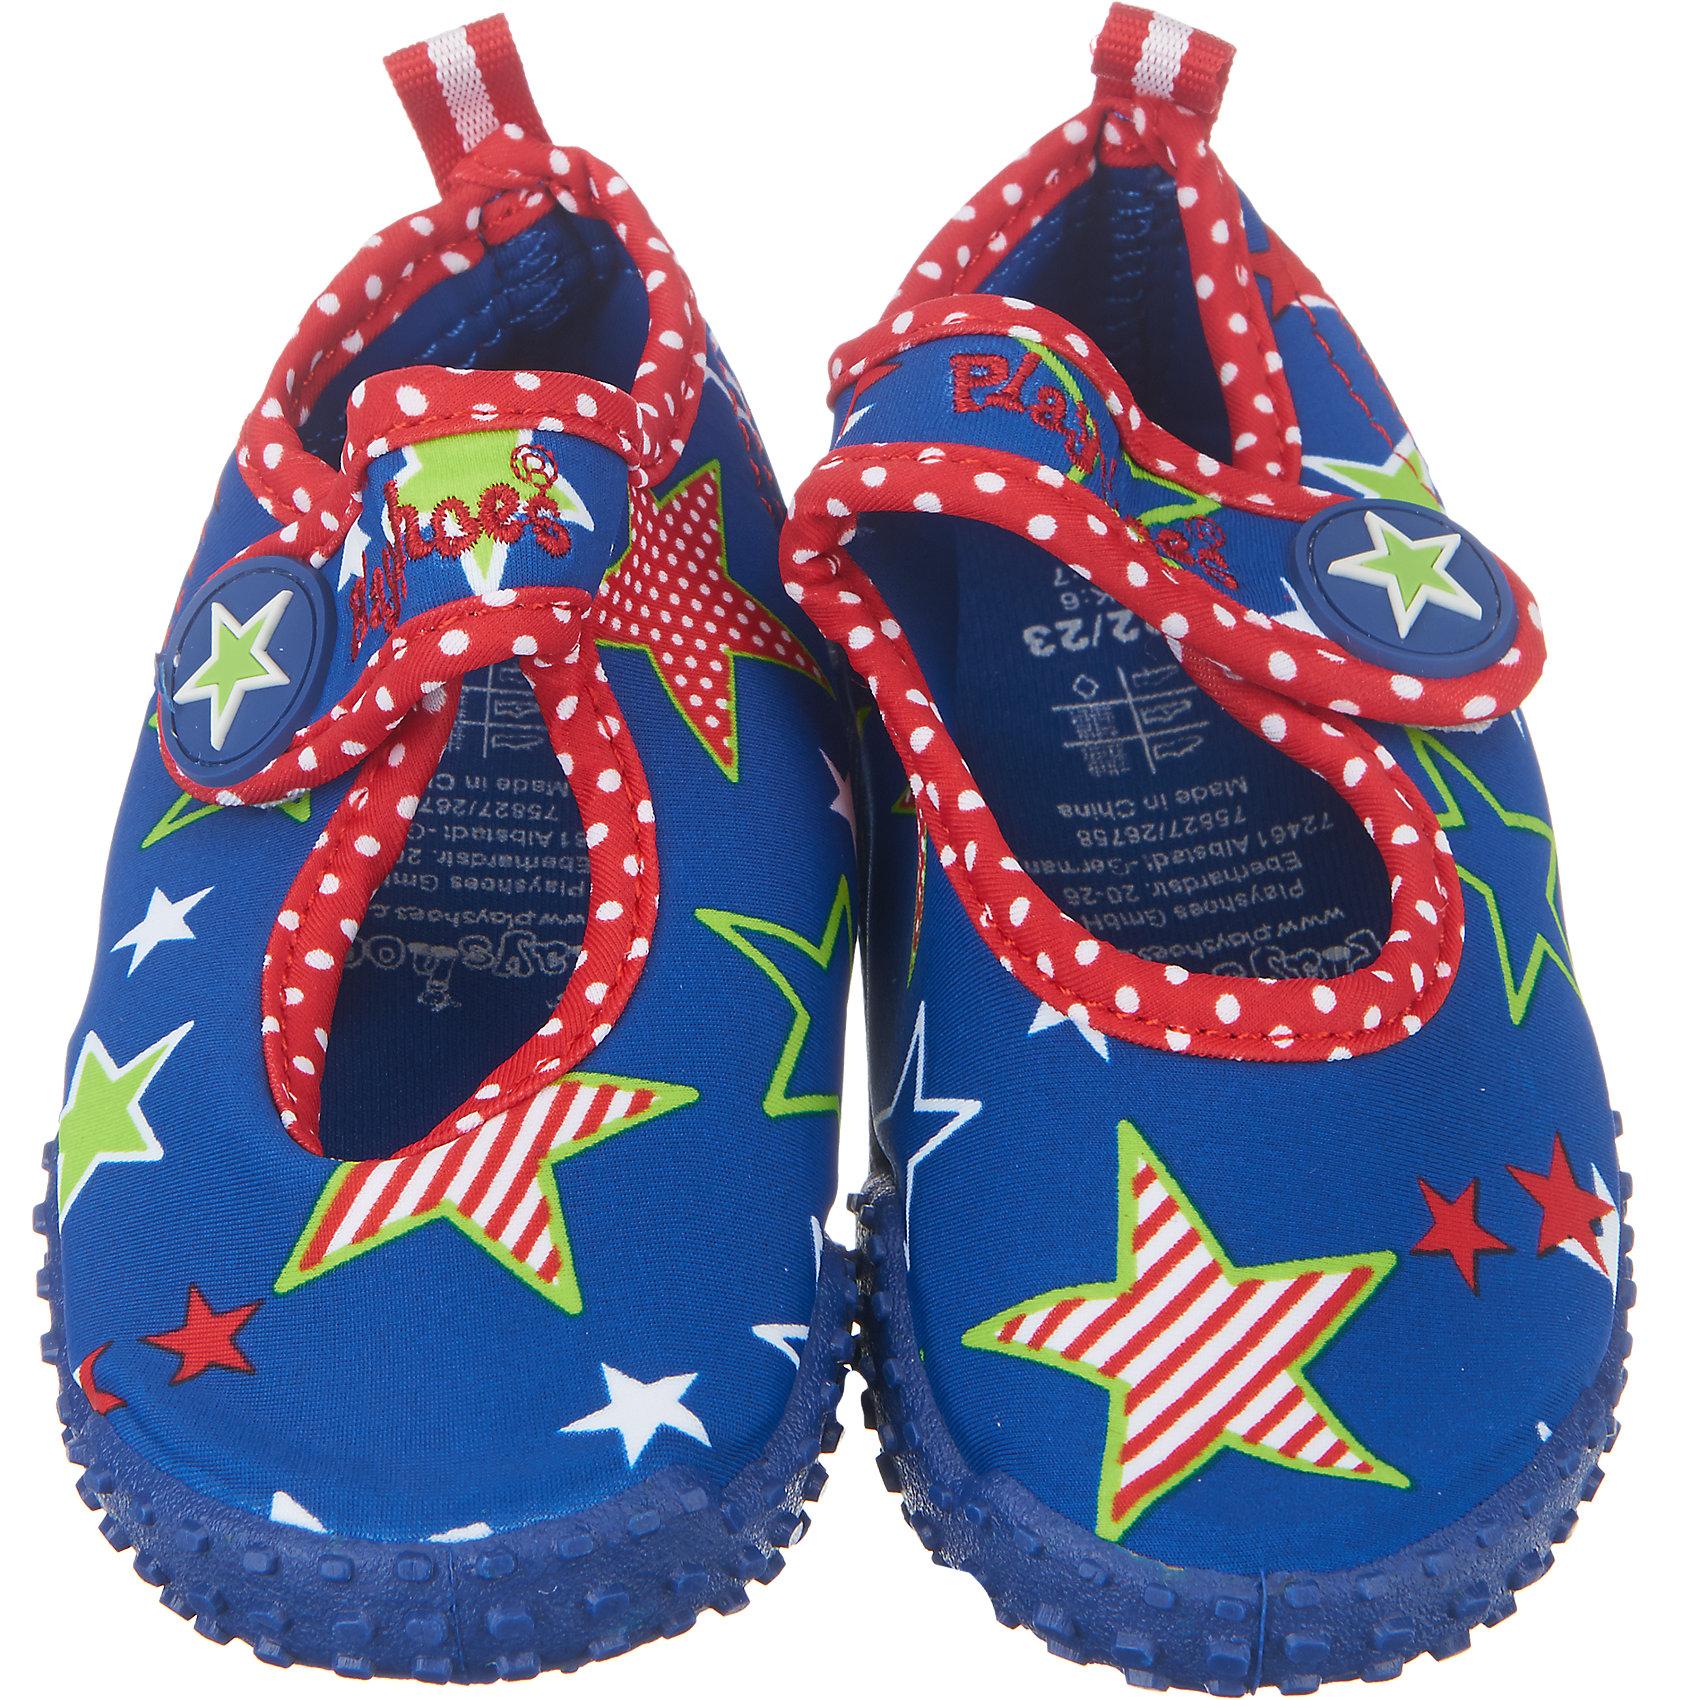 Neu-Playshoes-UV-Schutz-Kinder-Aqua-Schuhe-Sterne-5990537-fuer-Maedchen